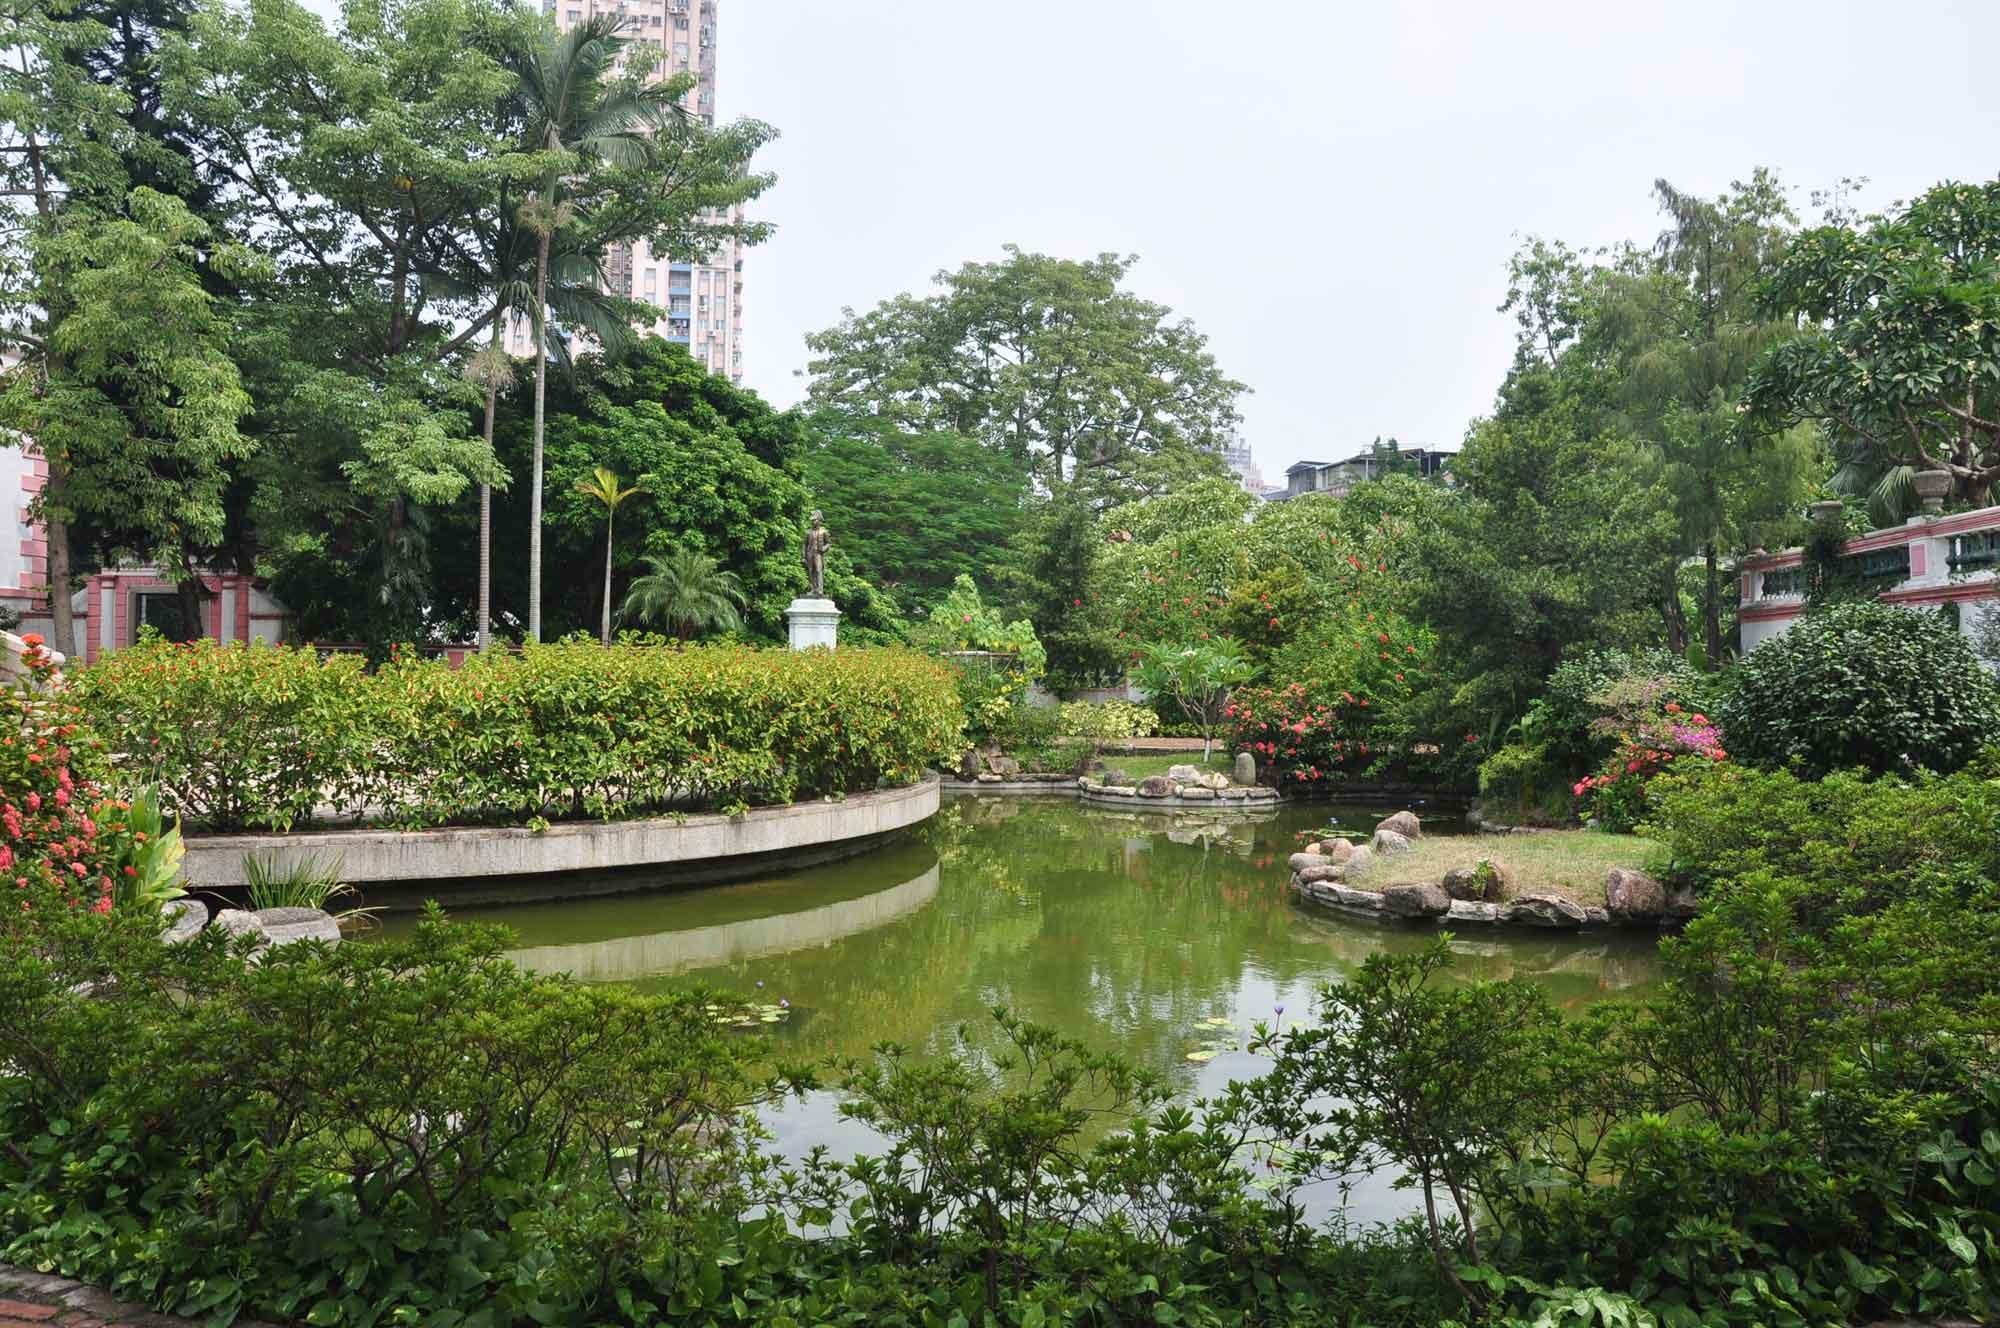 Casa Garden pond